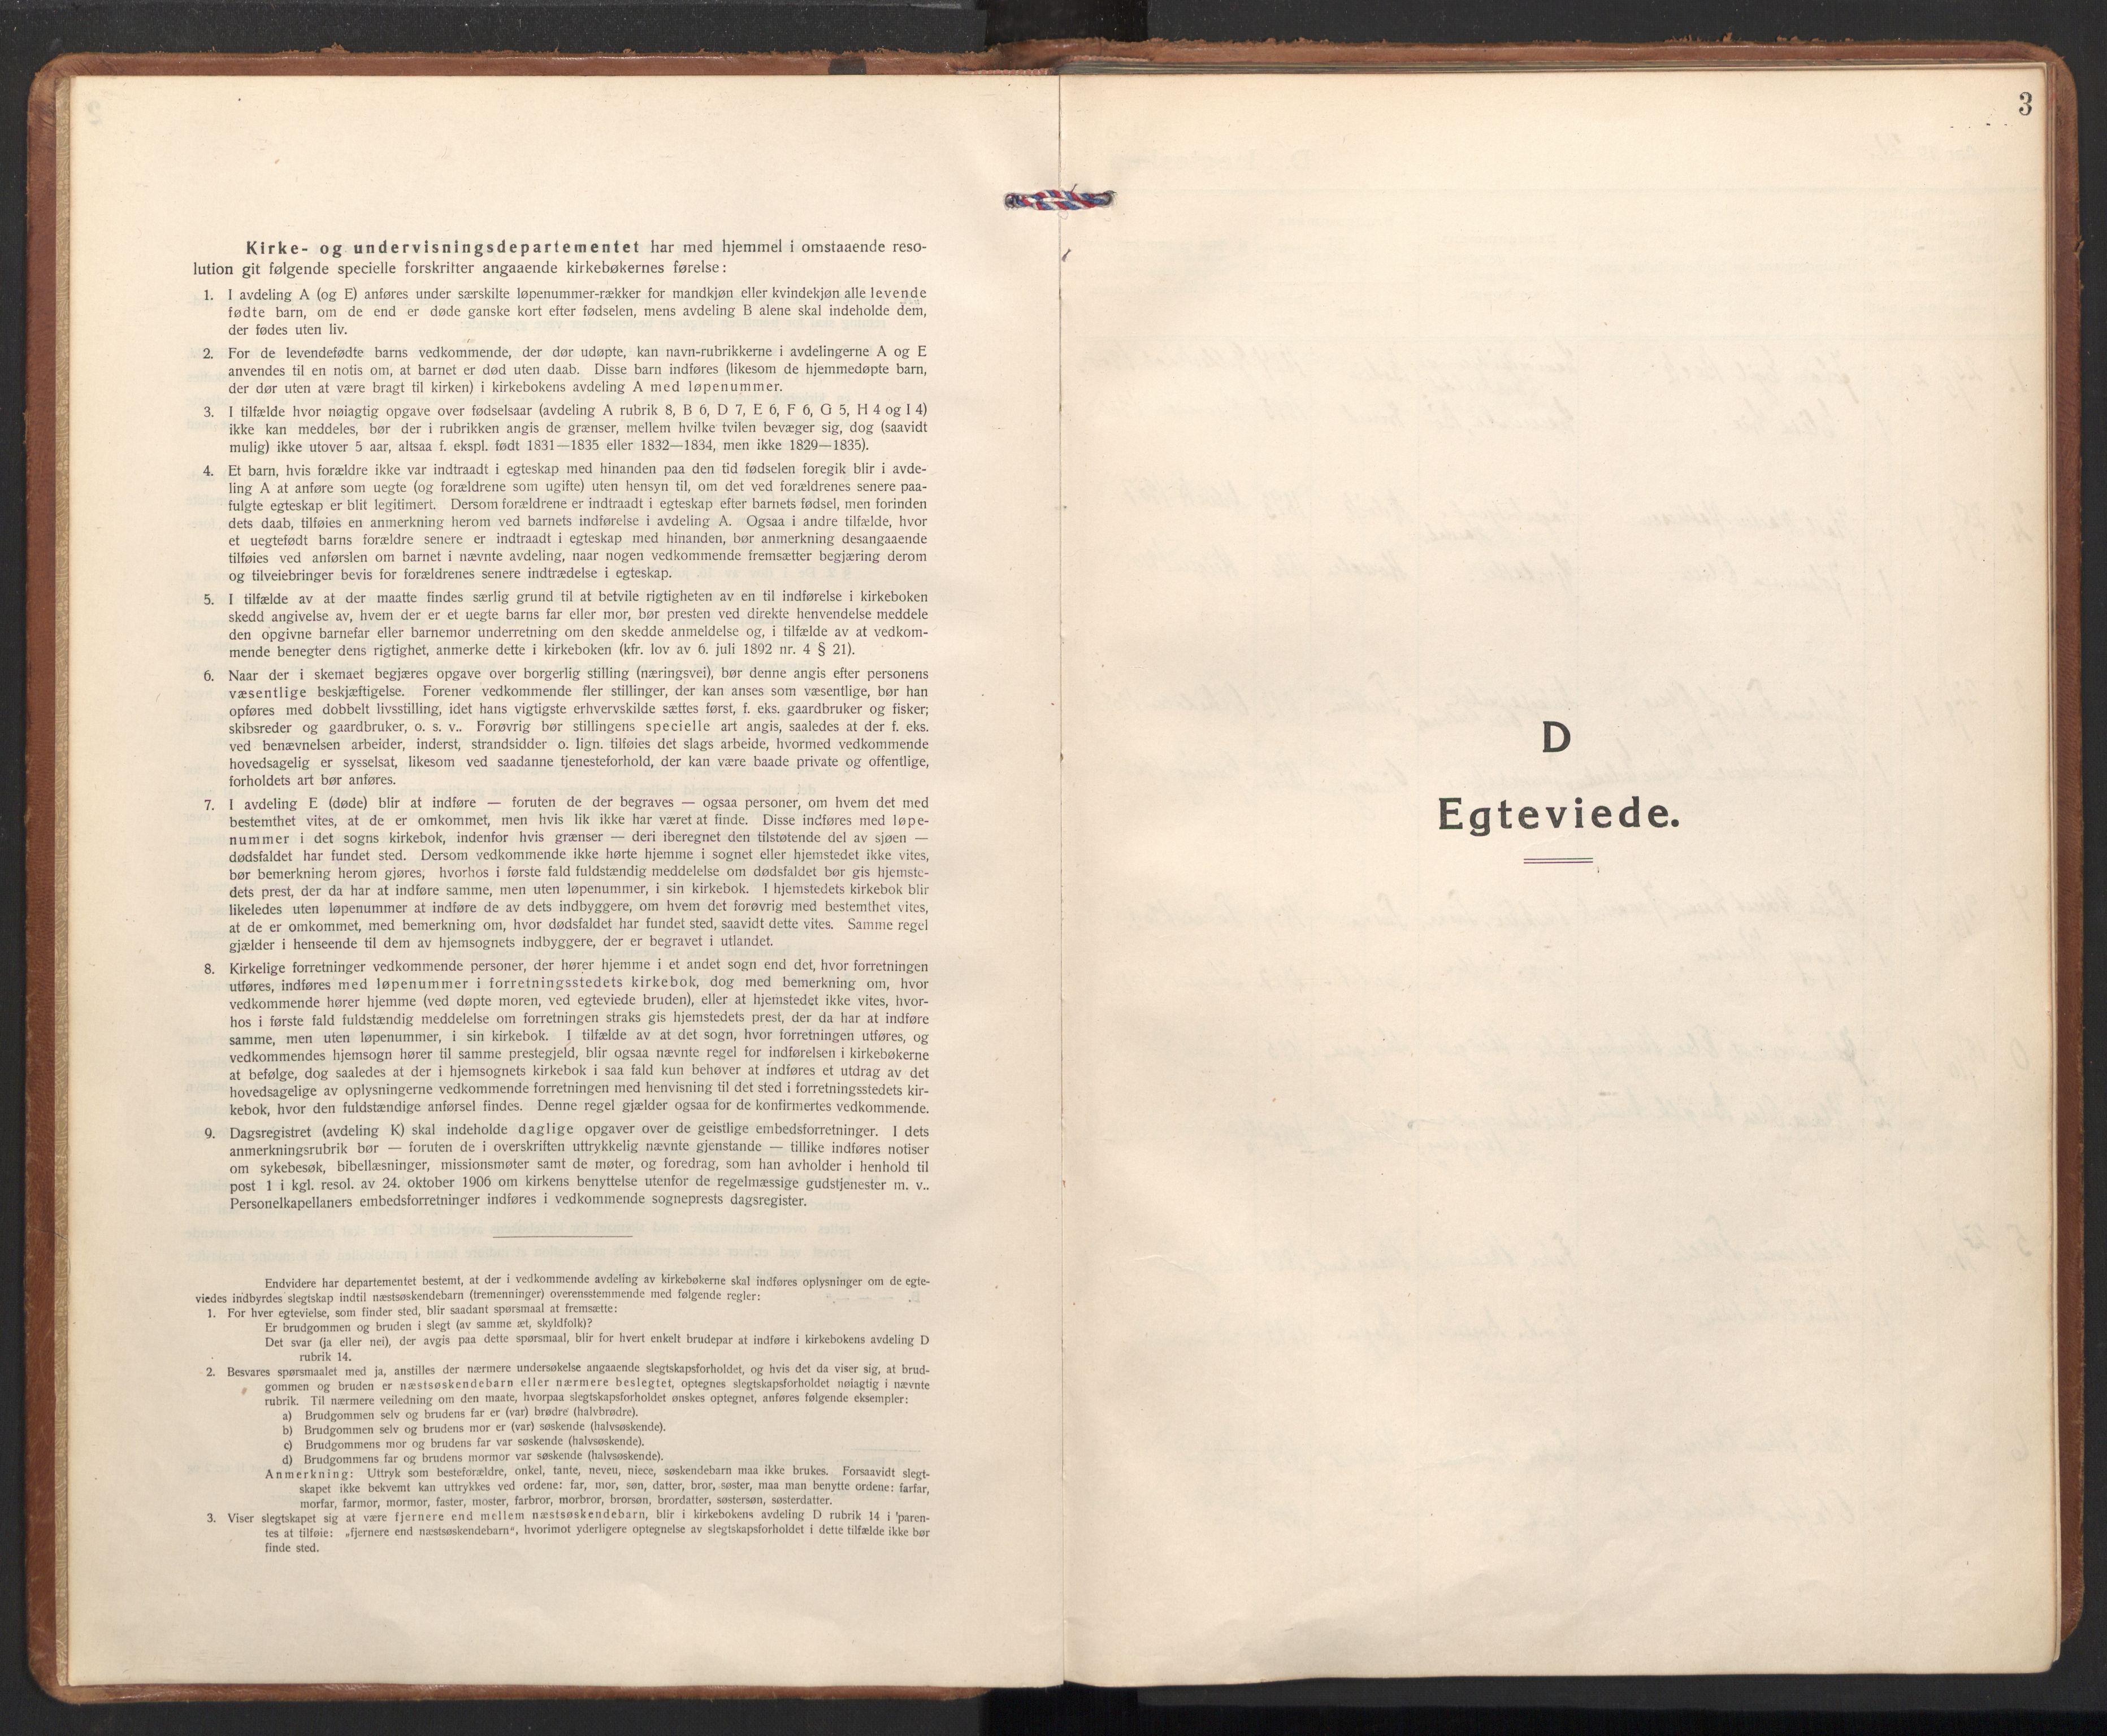 SAT, Ministerialprotokoller, klokkerbøker og fødselsregistre - Nordland, 855/L0809: Ministerialbok nr. 855A18, 1921-1939, s. 3